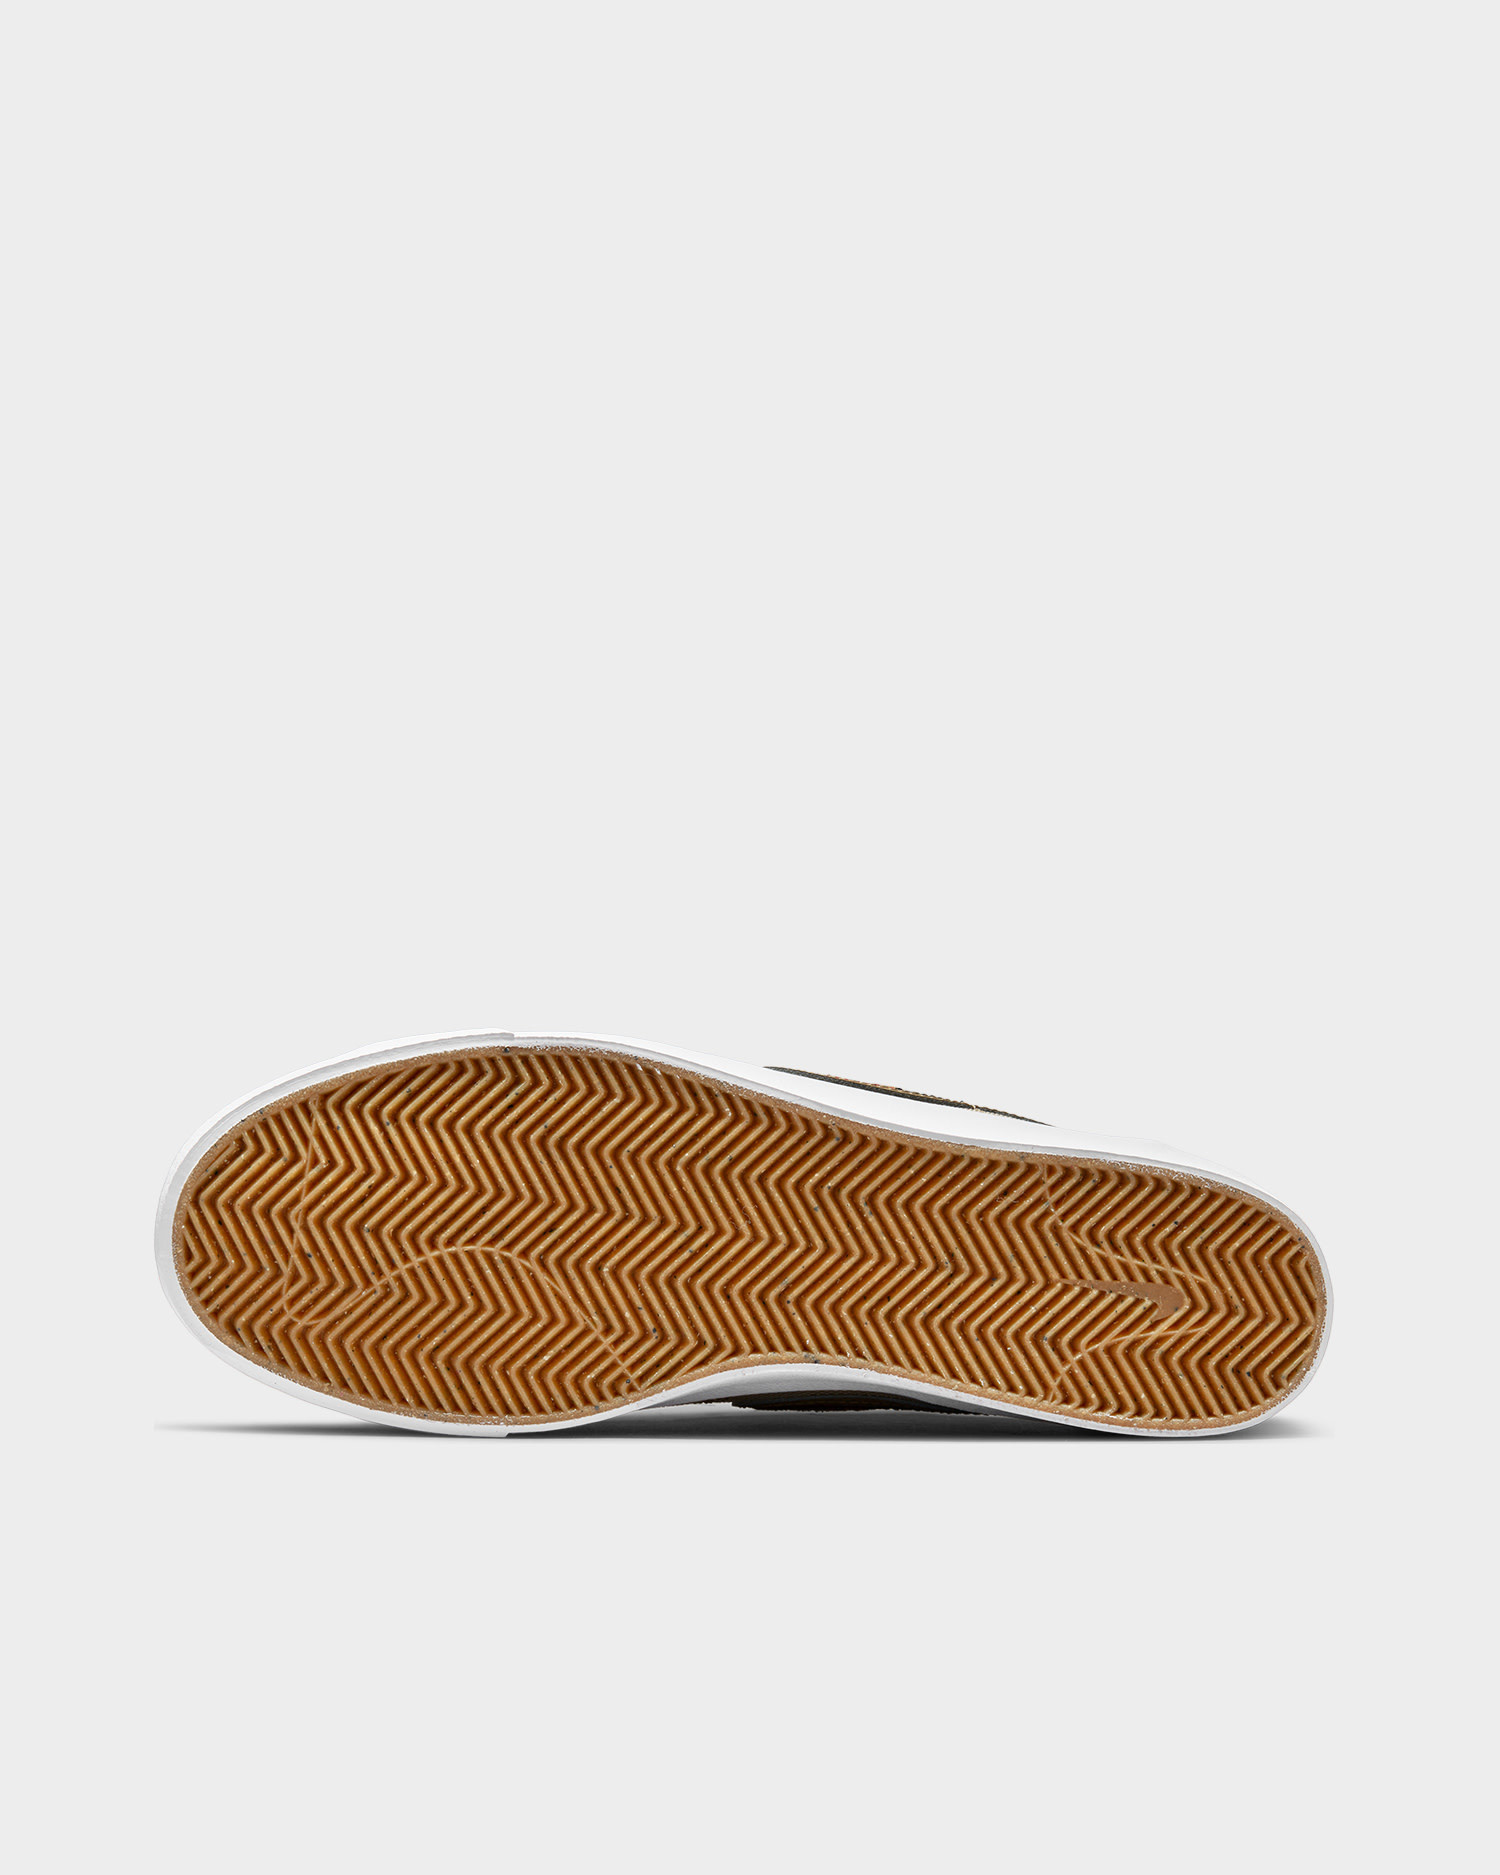 Nike sb blzr court dvdl Grain/parachute beige-light bone-sail